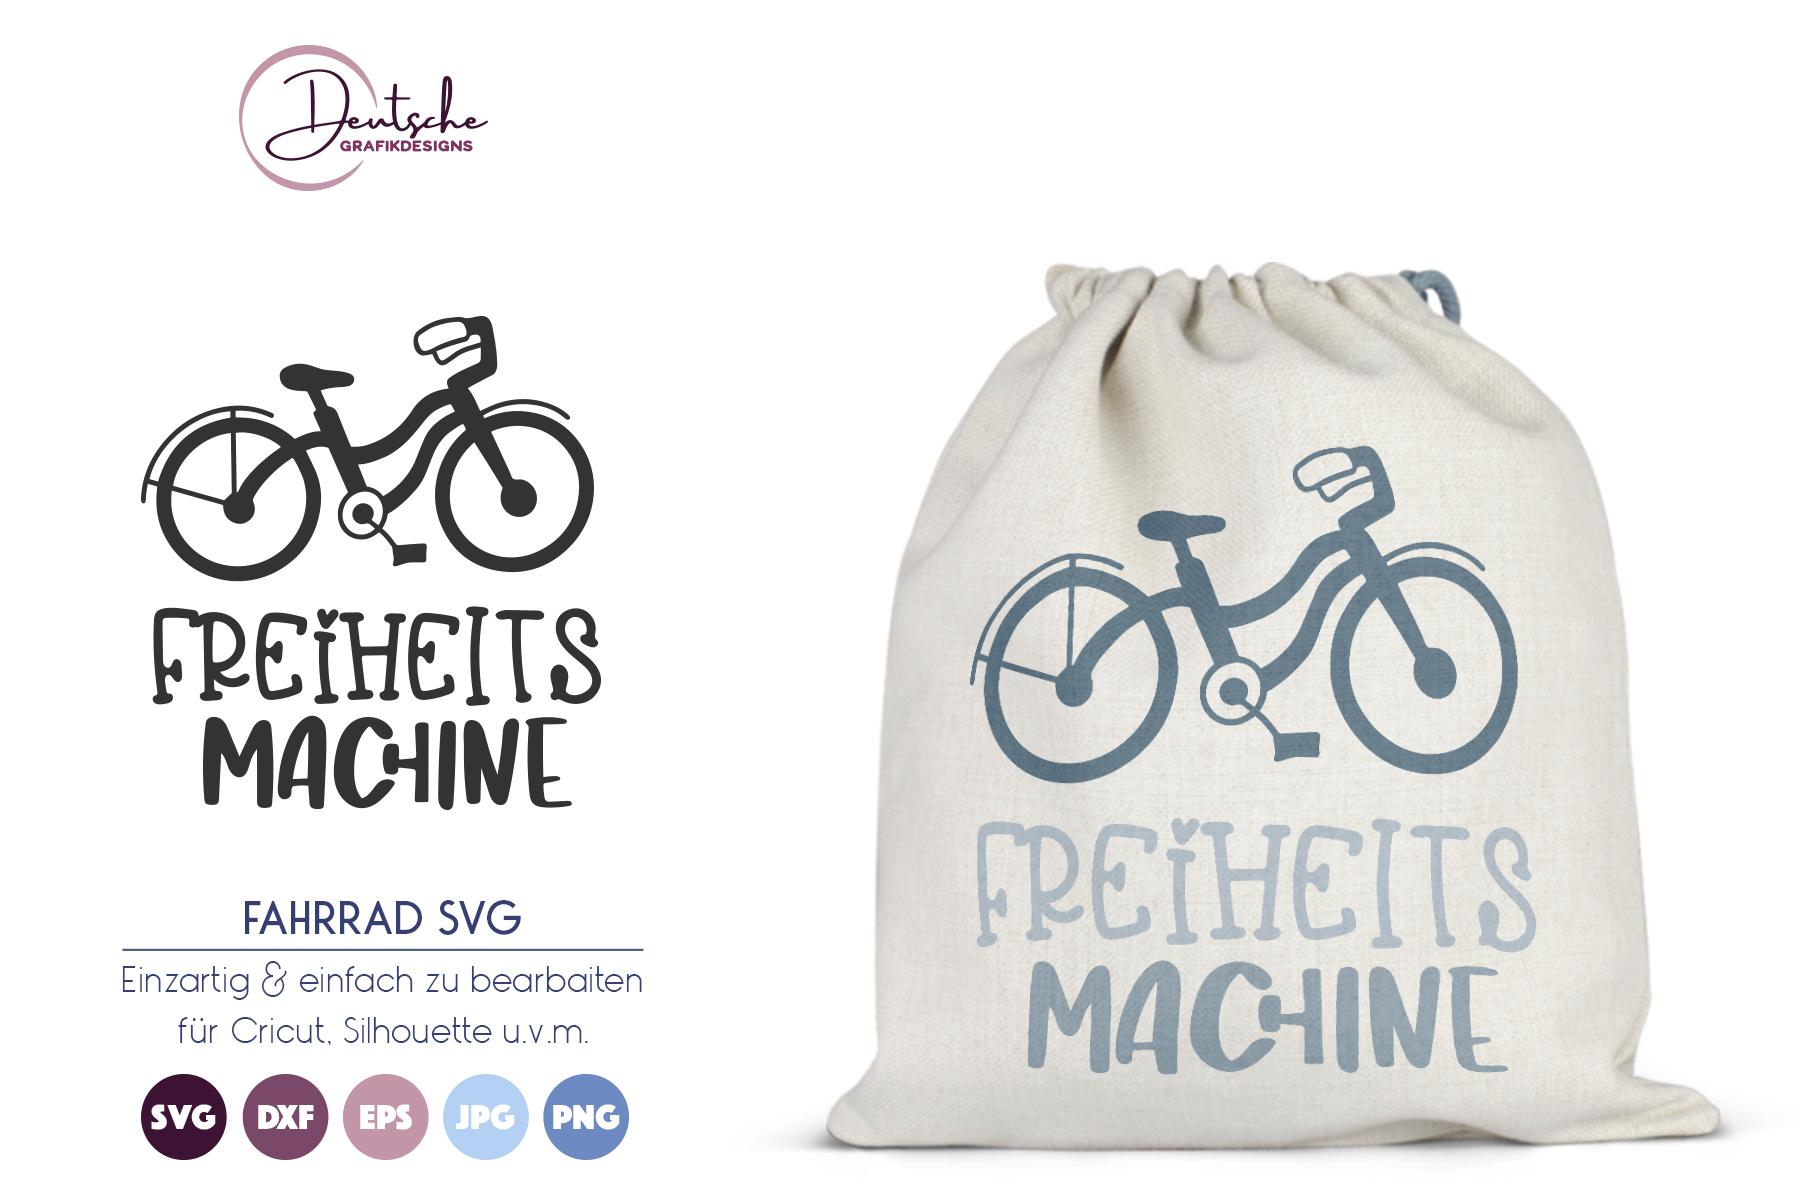 Fahrrad SVG | Freiheits Machine example image 1